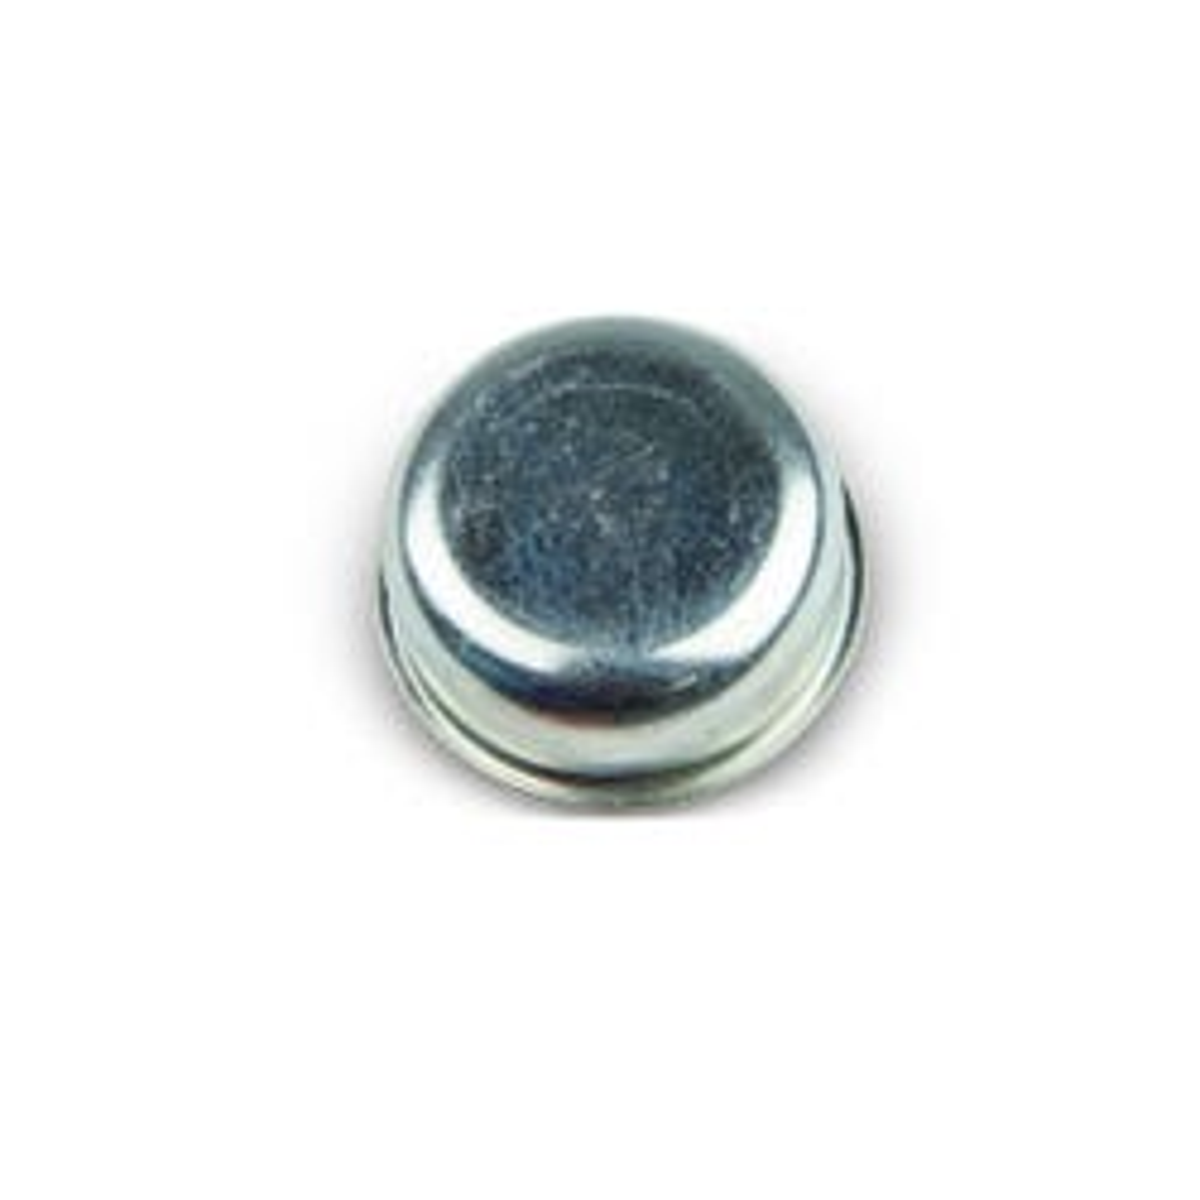 Dust Cap for Standard Axle Hub (5,200-6,000 lbs.) - 10 Pack